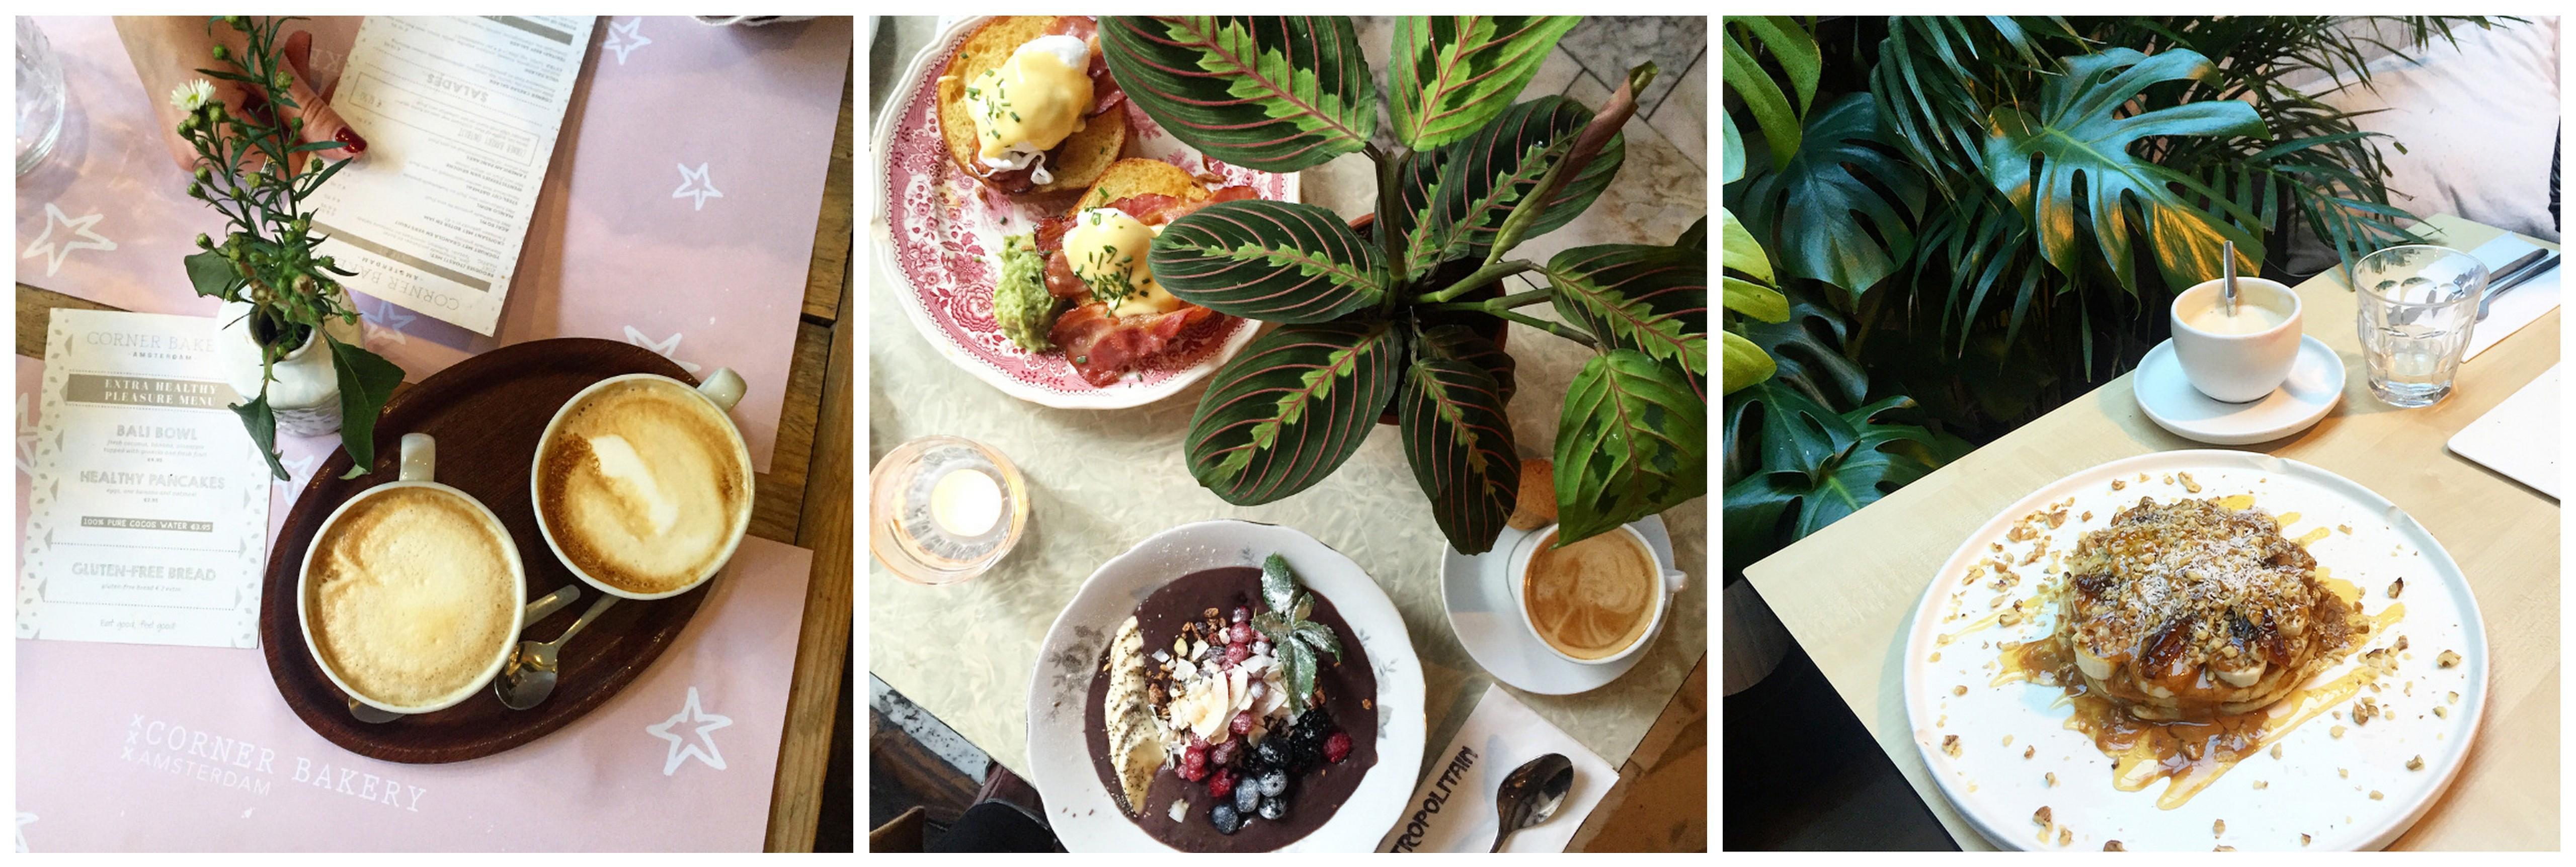 ontbijt-en-lunch-hotspot-amsterdam-to-coruscate